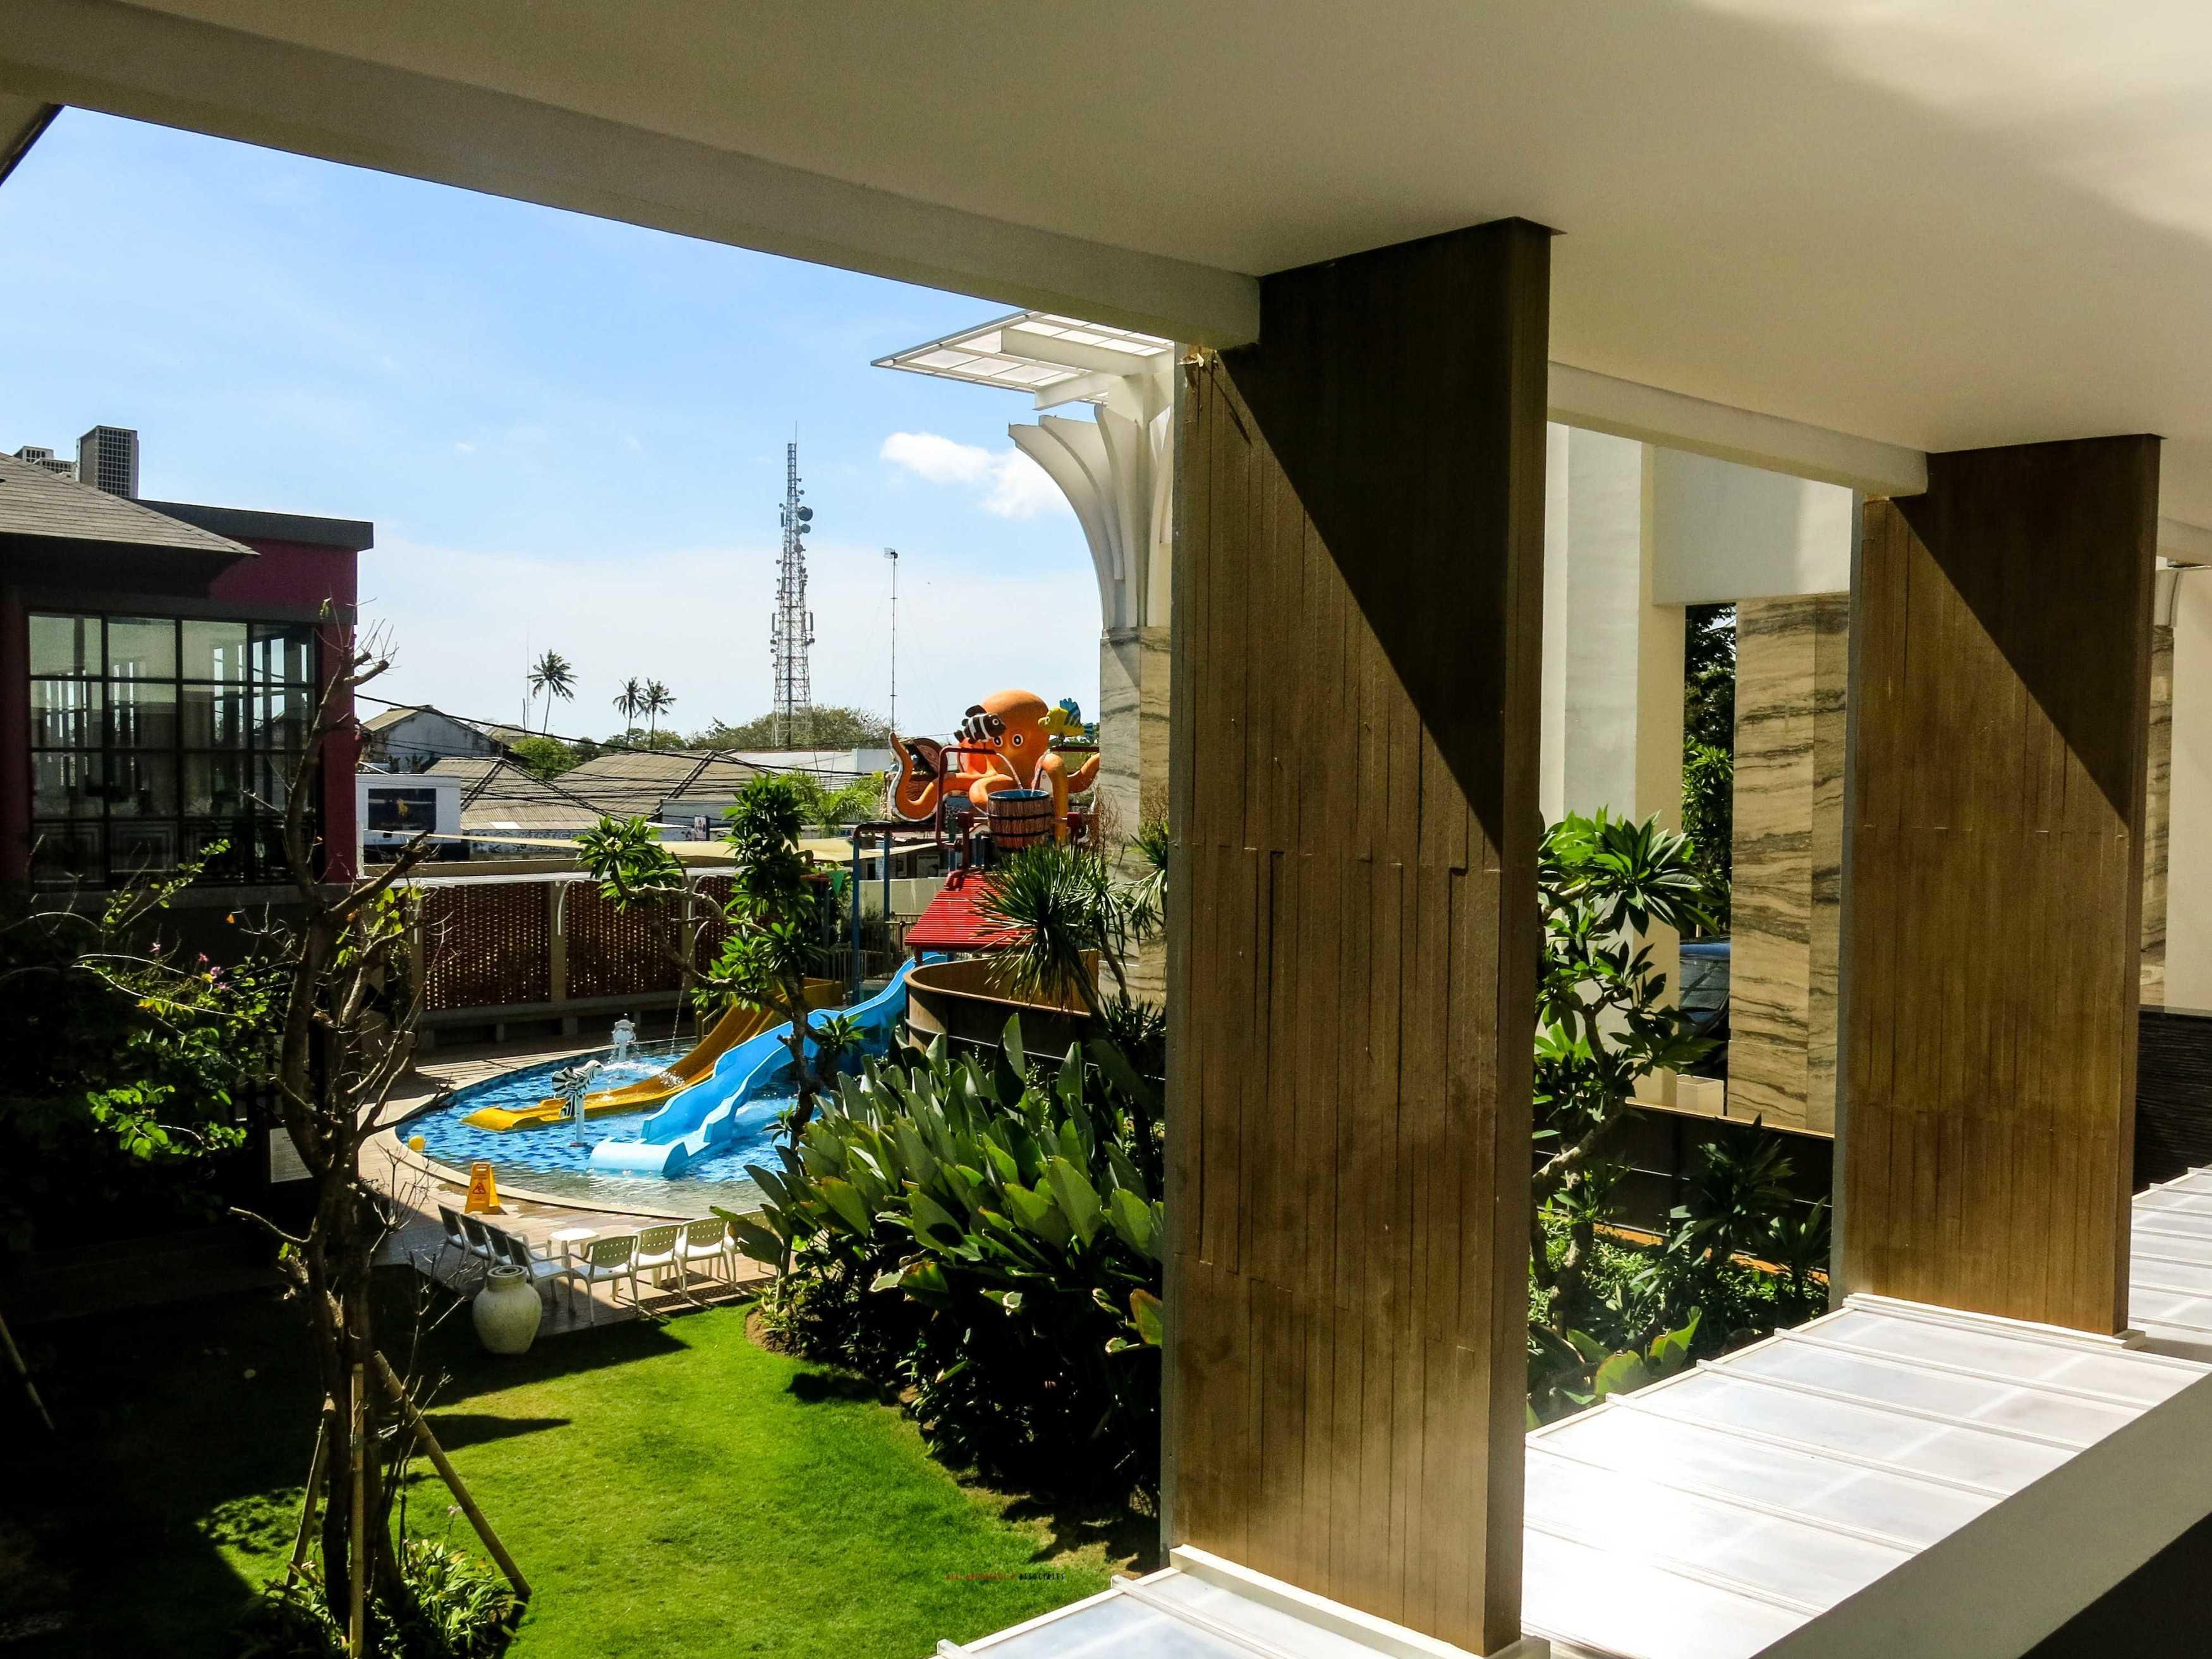 Arnold Iskandar G Intan Adapted To Present Tj. Benoa, Kuta Sel., Kabupaten Badung, Bali, Indonesia Tj. Benoa, Kuta Sel., Kabupaten Badung, Bali, Indonesia Arnold-Iskandar-G-Intan-Adapted-To-Present   63356